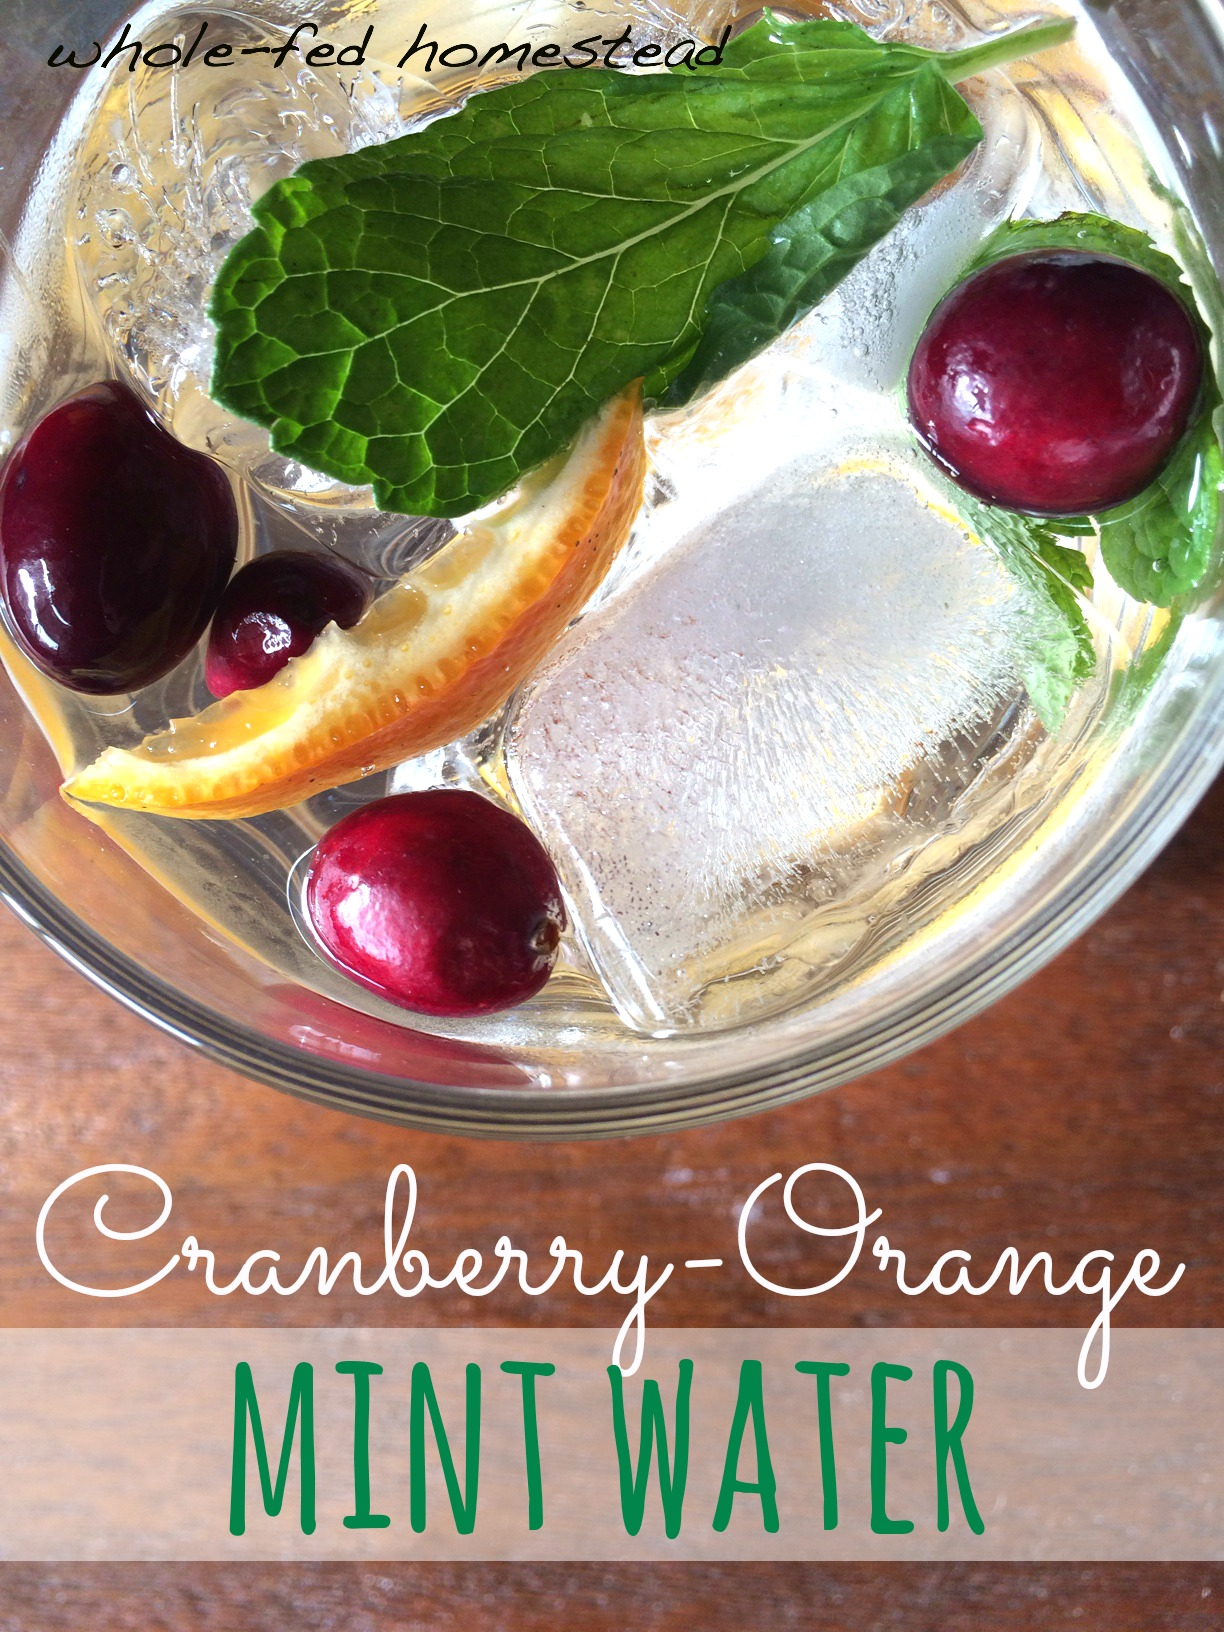 Cranberry Orange Mint Flavored Water